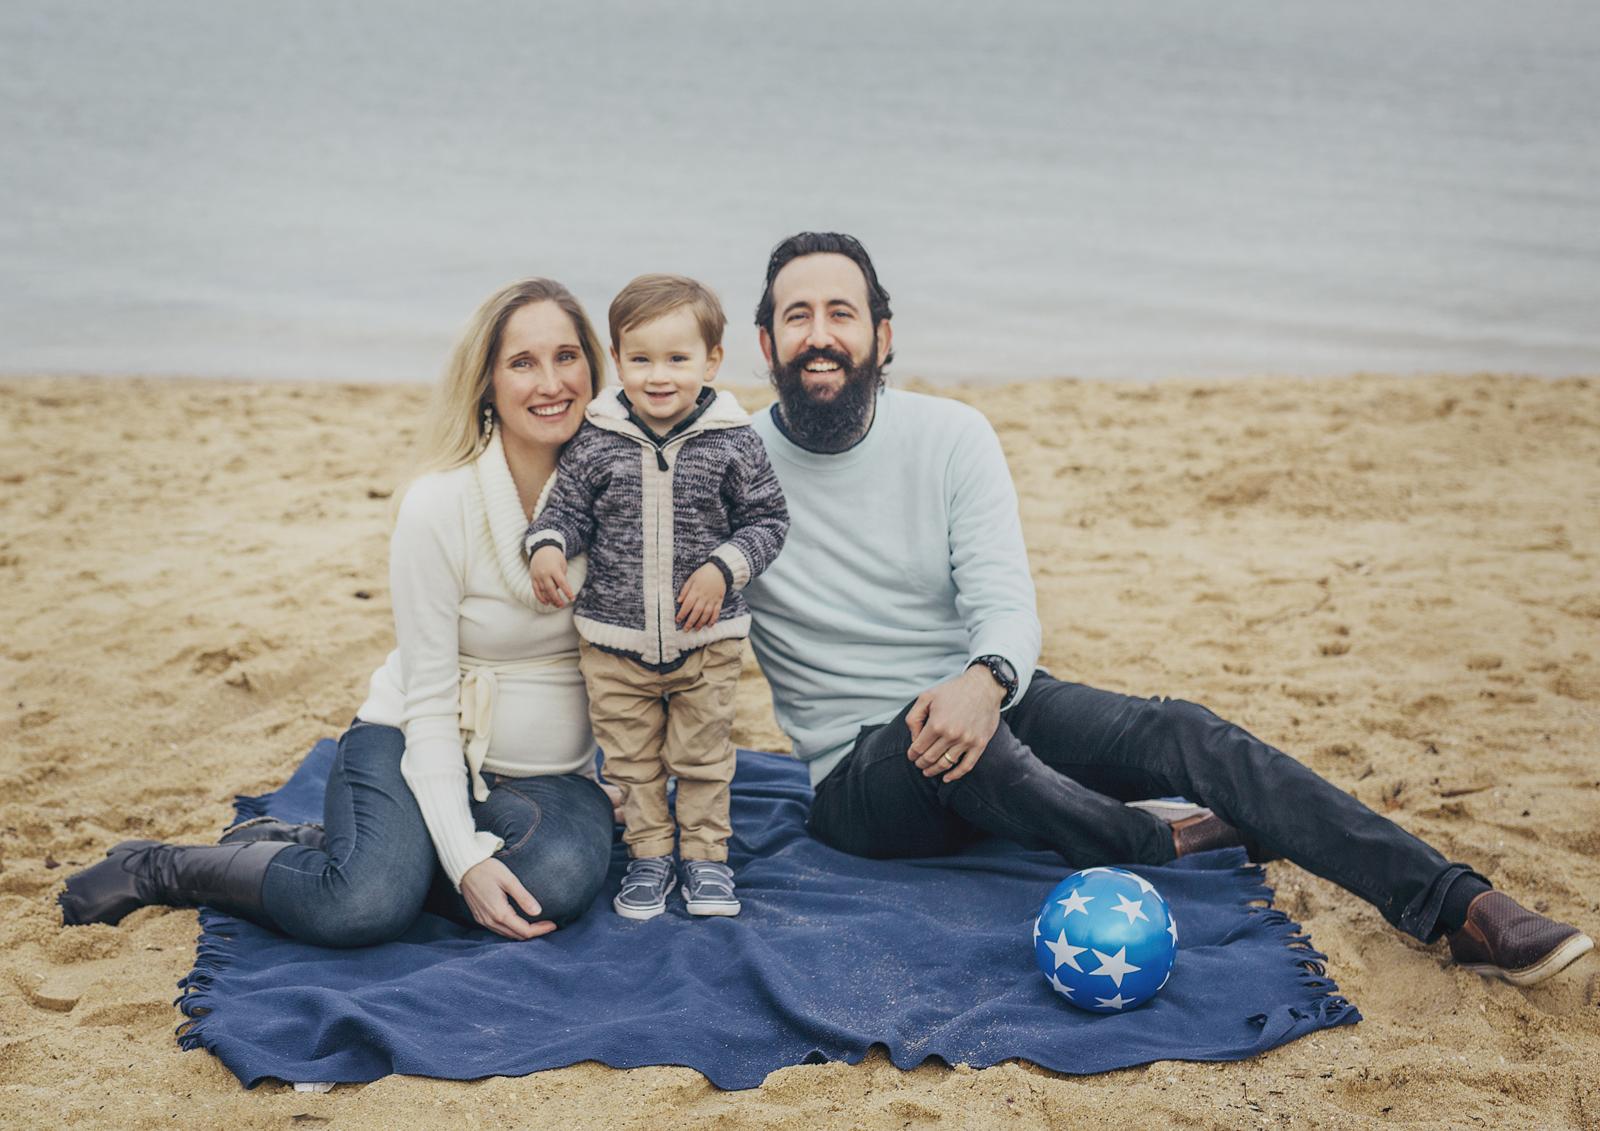 Family photo shoot down at Elwood beach